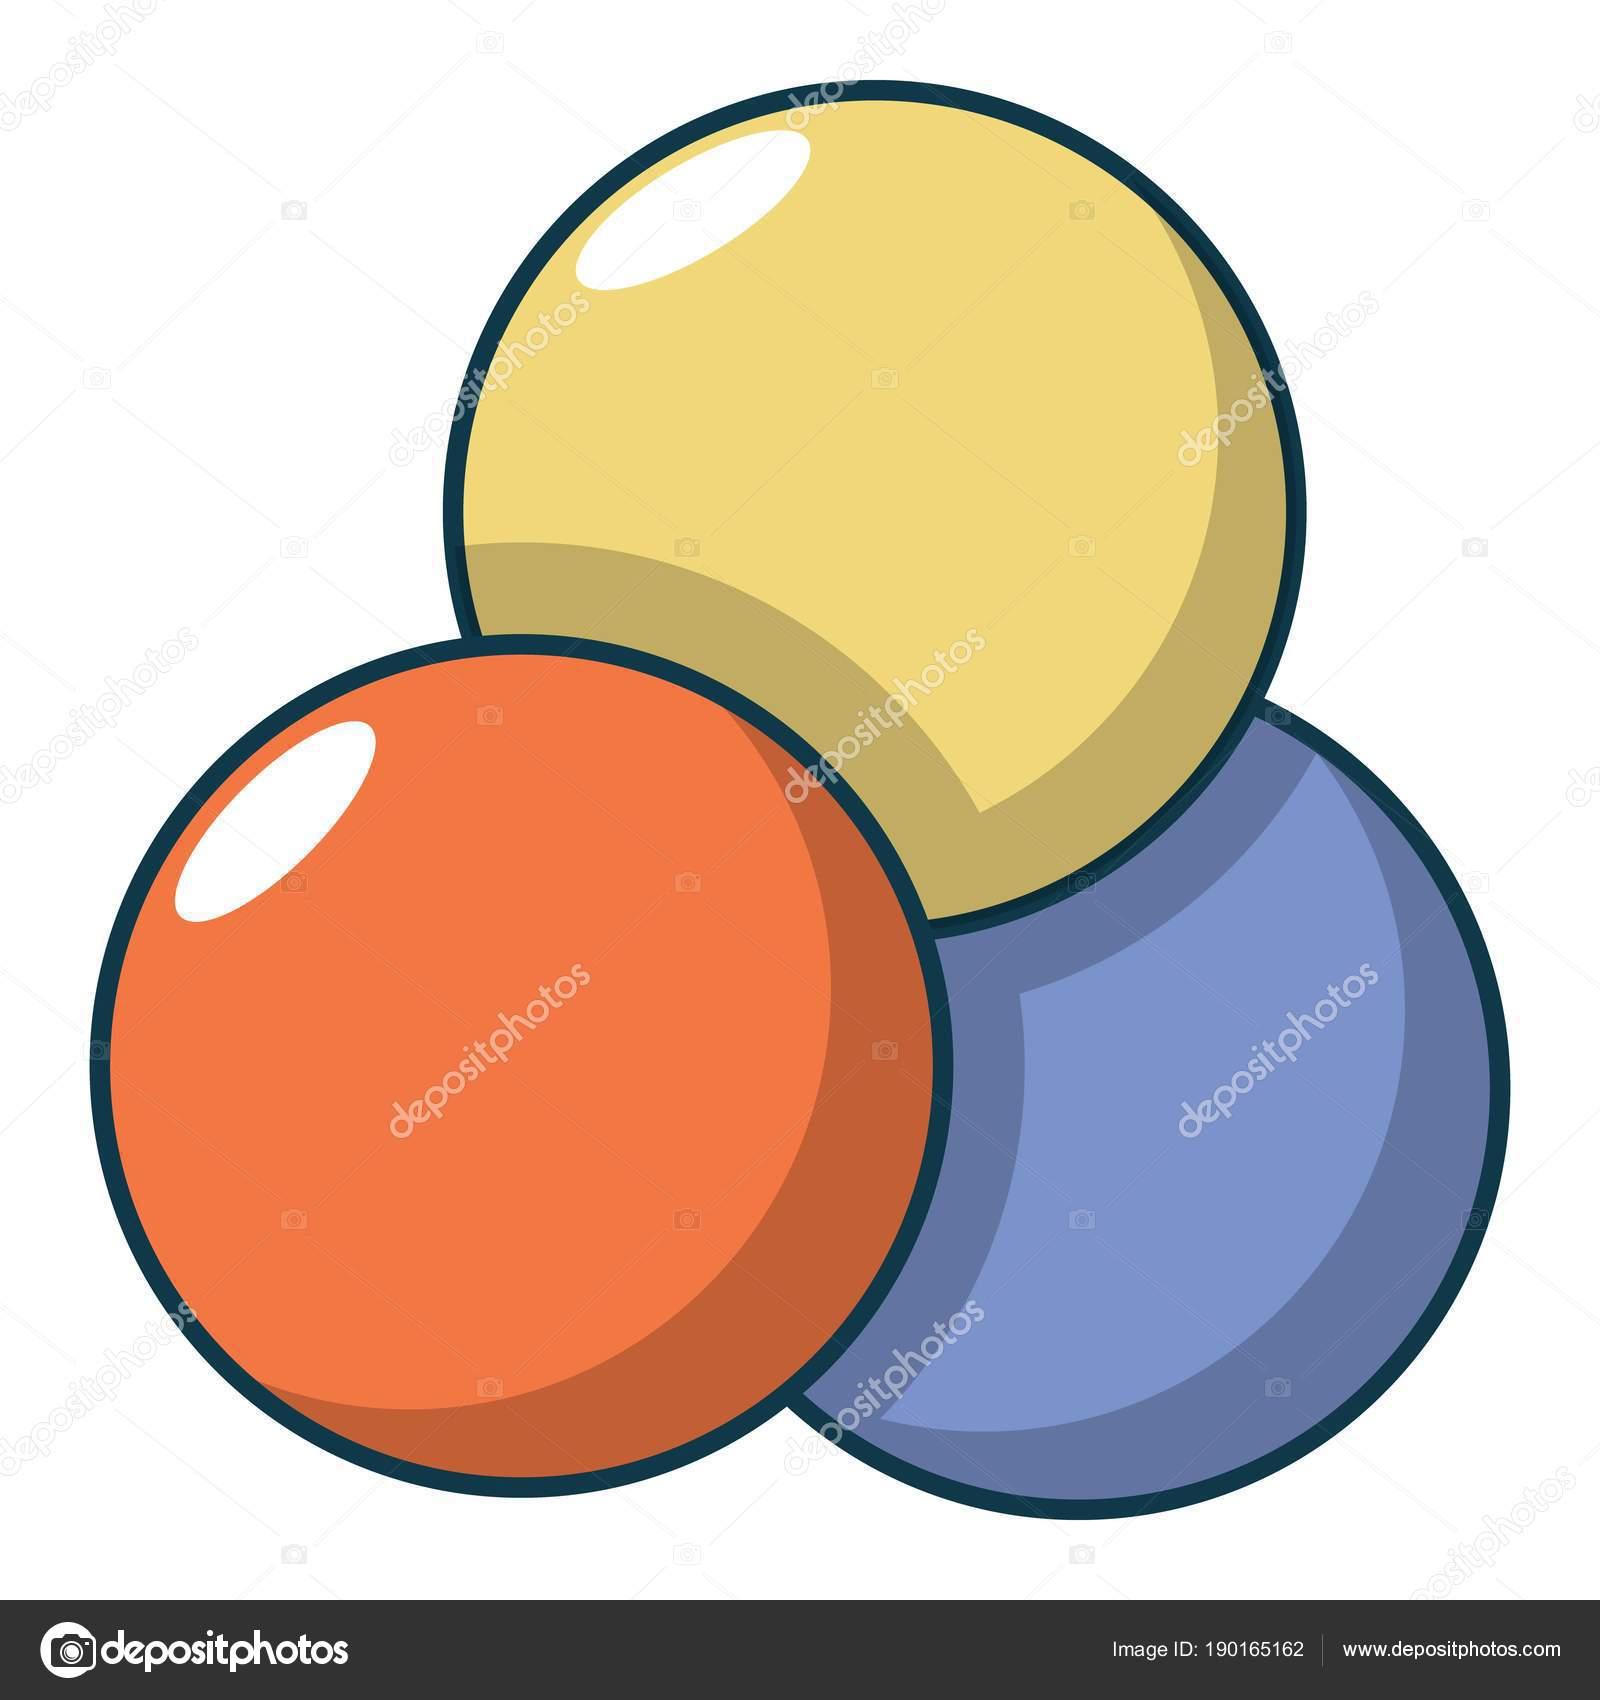 Icono De Bolas De Paintball Estilo De Dibujos Animados Vector De